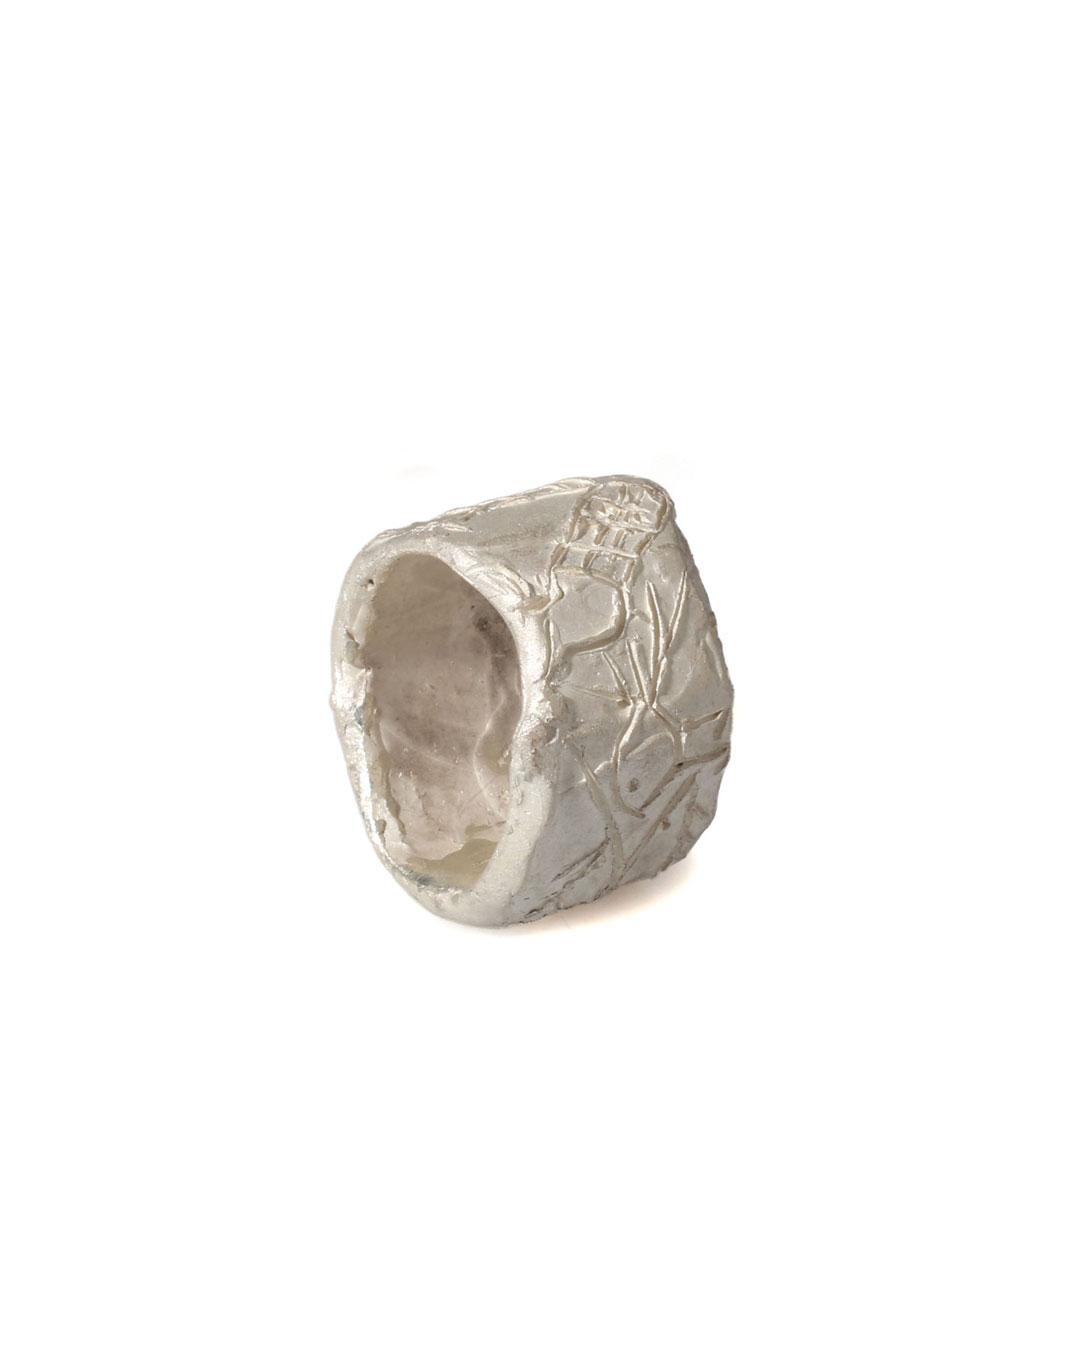 Juliane Brandes, zonder titel, 2014, ring; zilver, 24 x 15 mm, €730